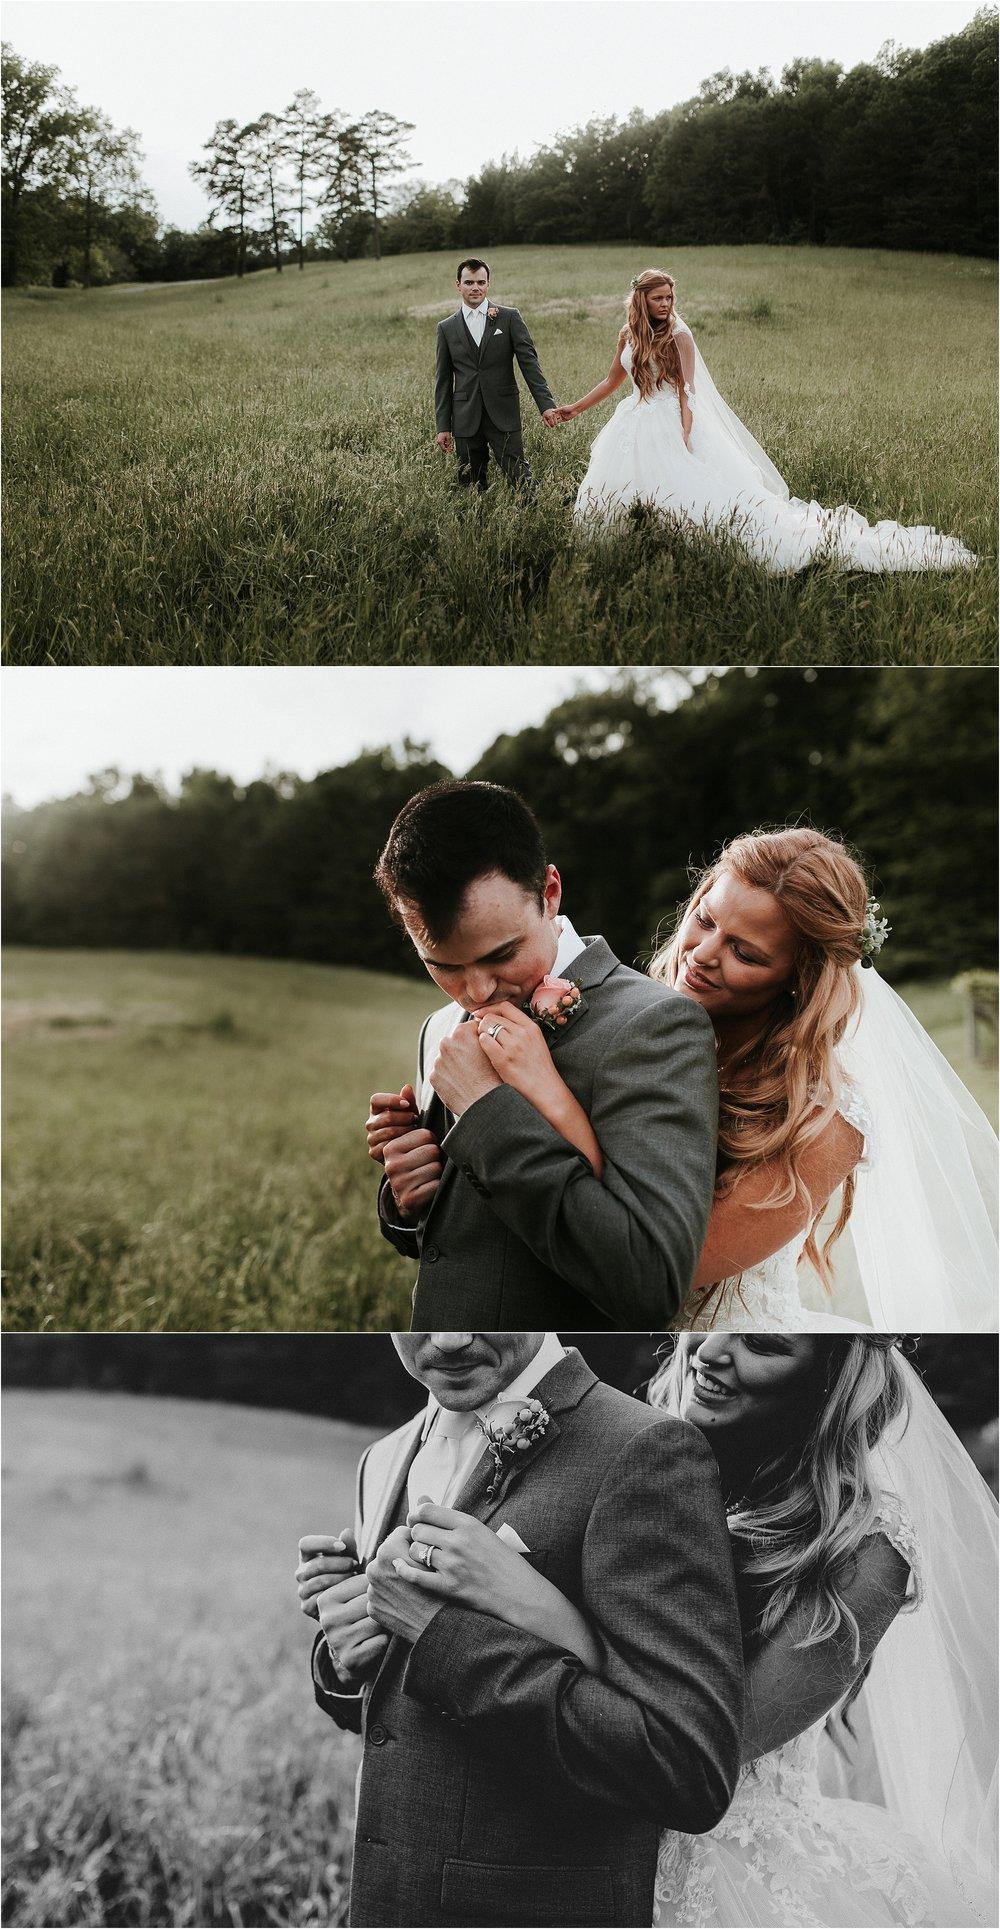 Carolina-Country-Weddings-Mount-Pleasant-nc-138.jpg